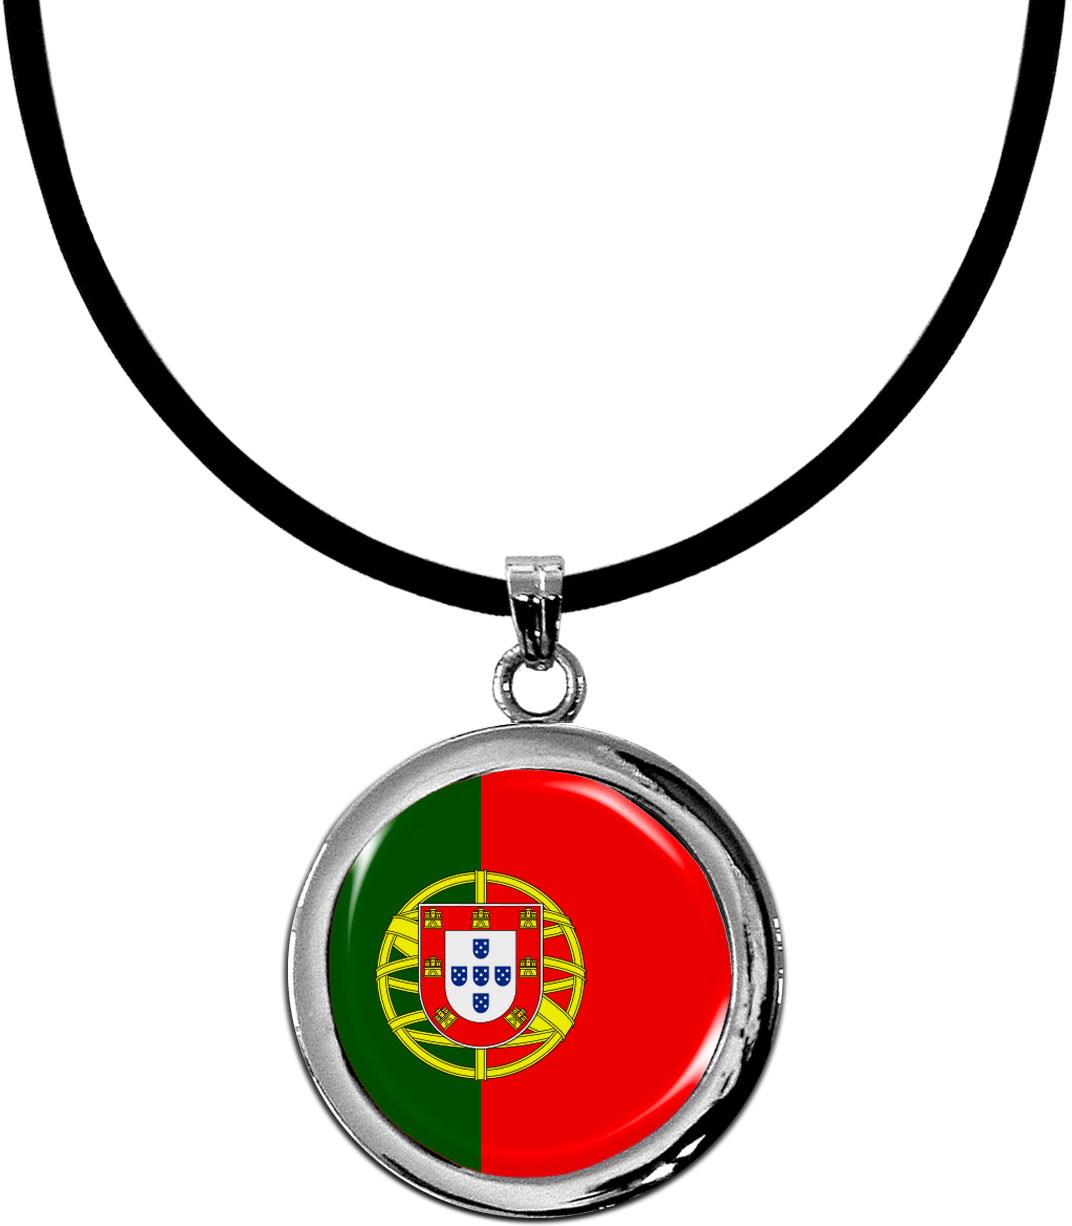 Kettenanhänger / Portugal / Silikonband mit Silberverschluss